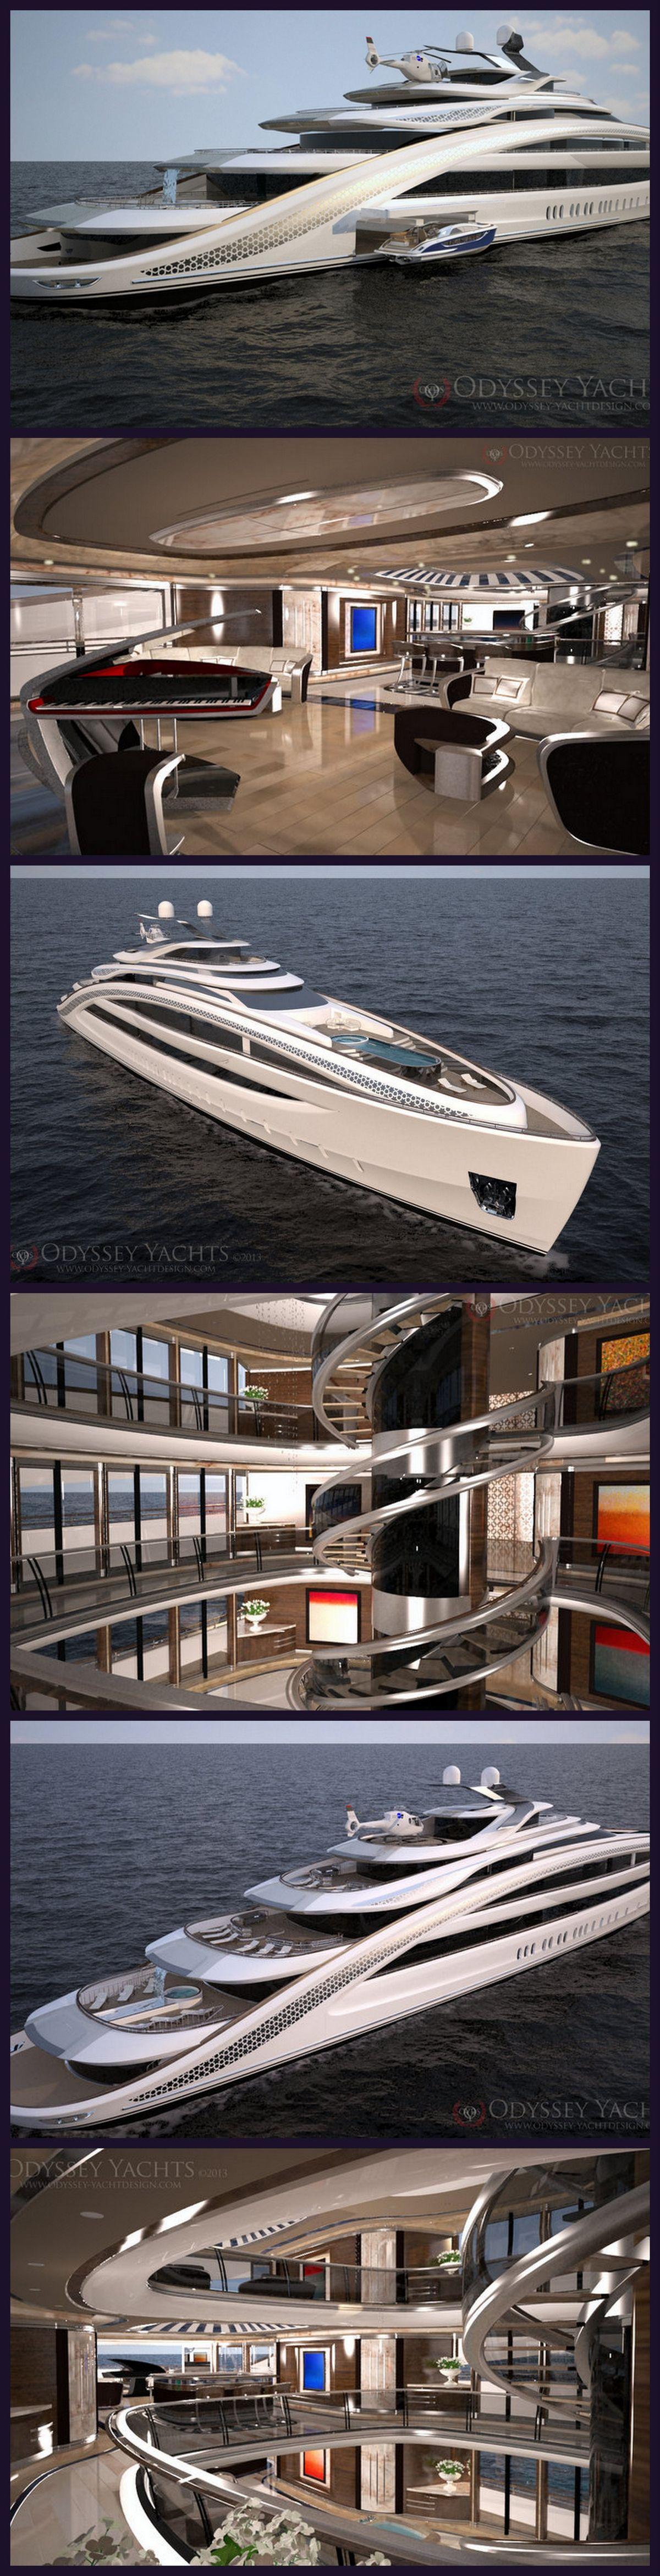 luxury motor yachts 15 best photos 40726124d8ac5efcc60dfe387130892f